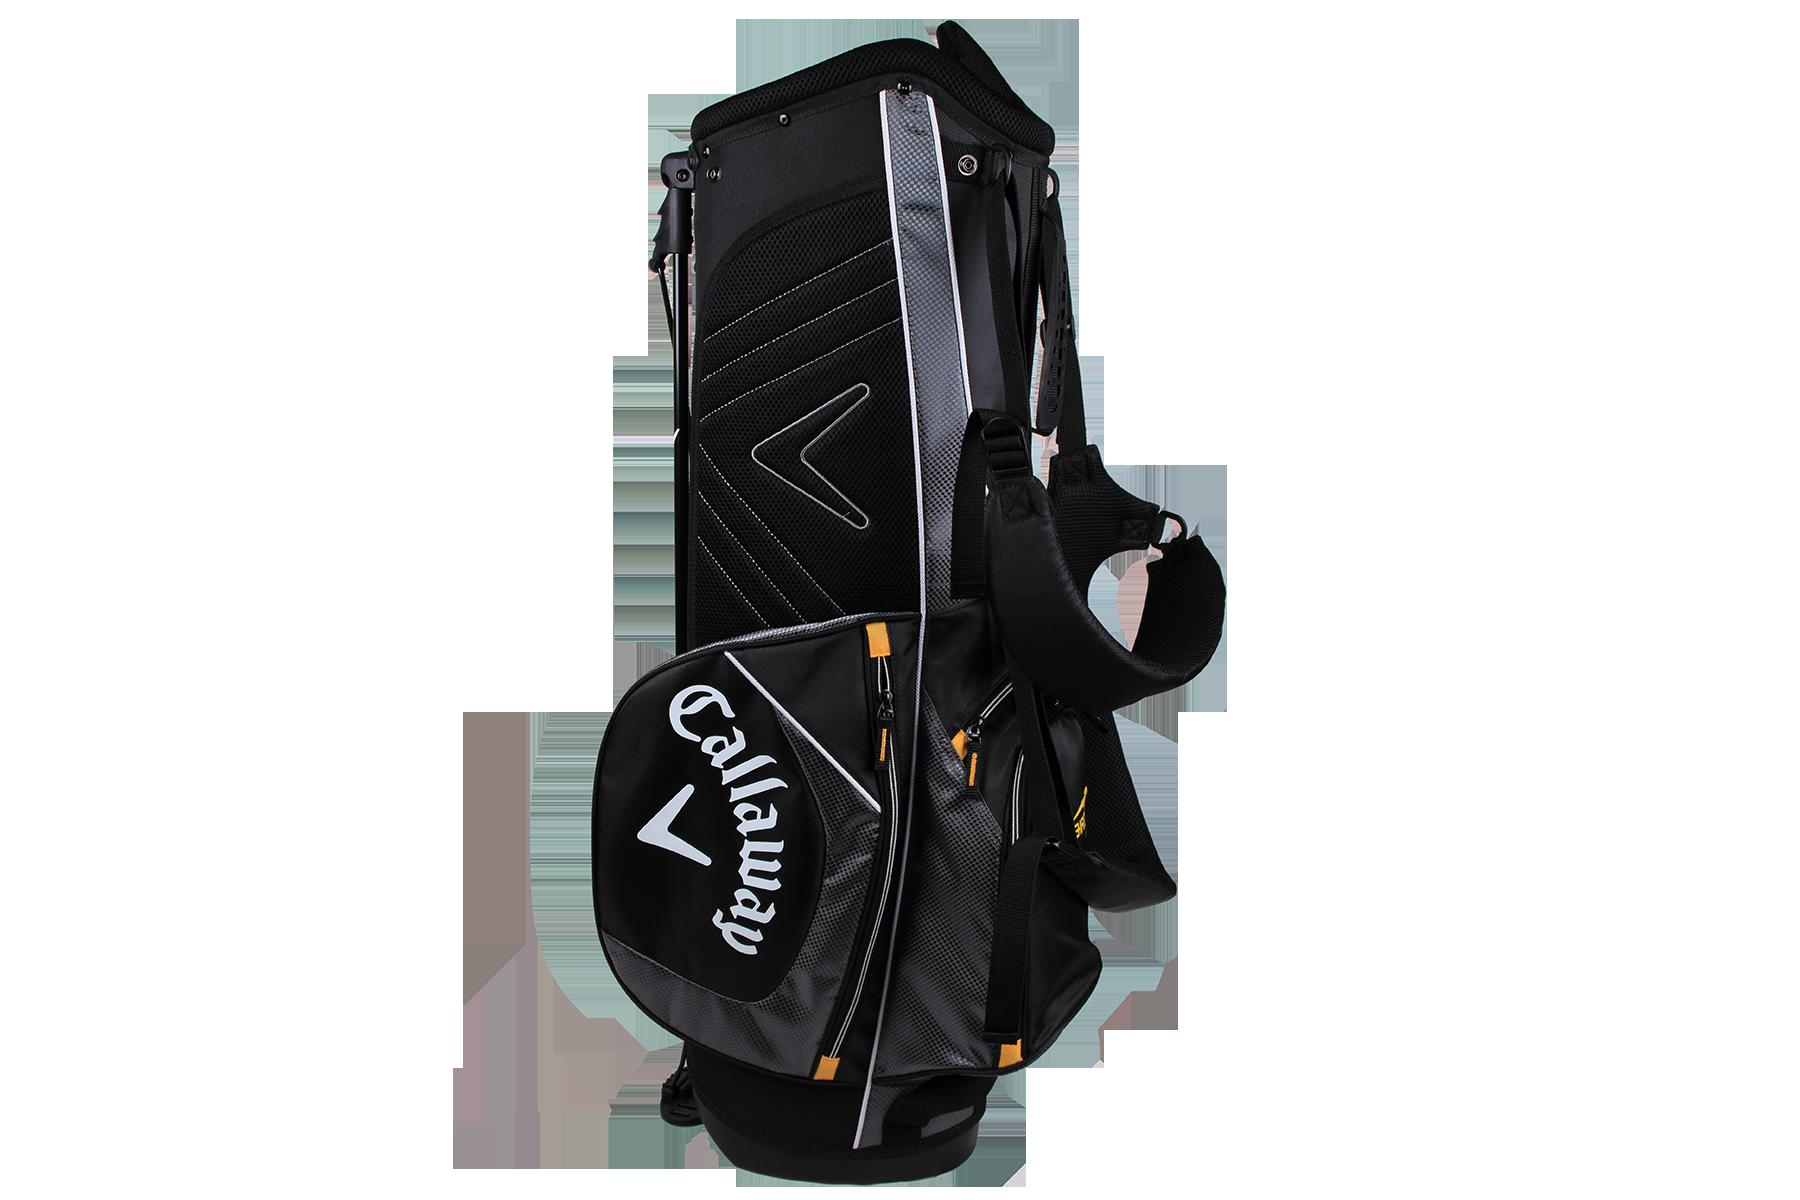 Callaway golf stand bag